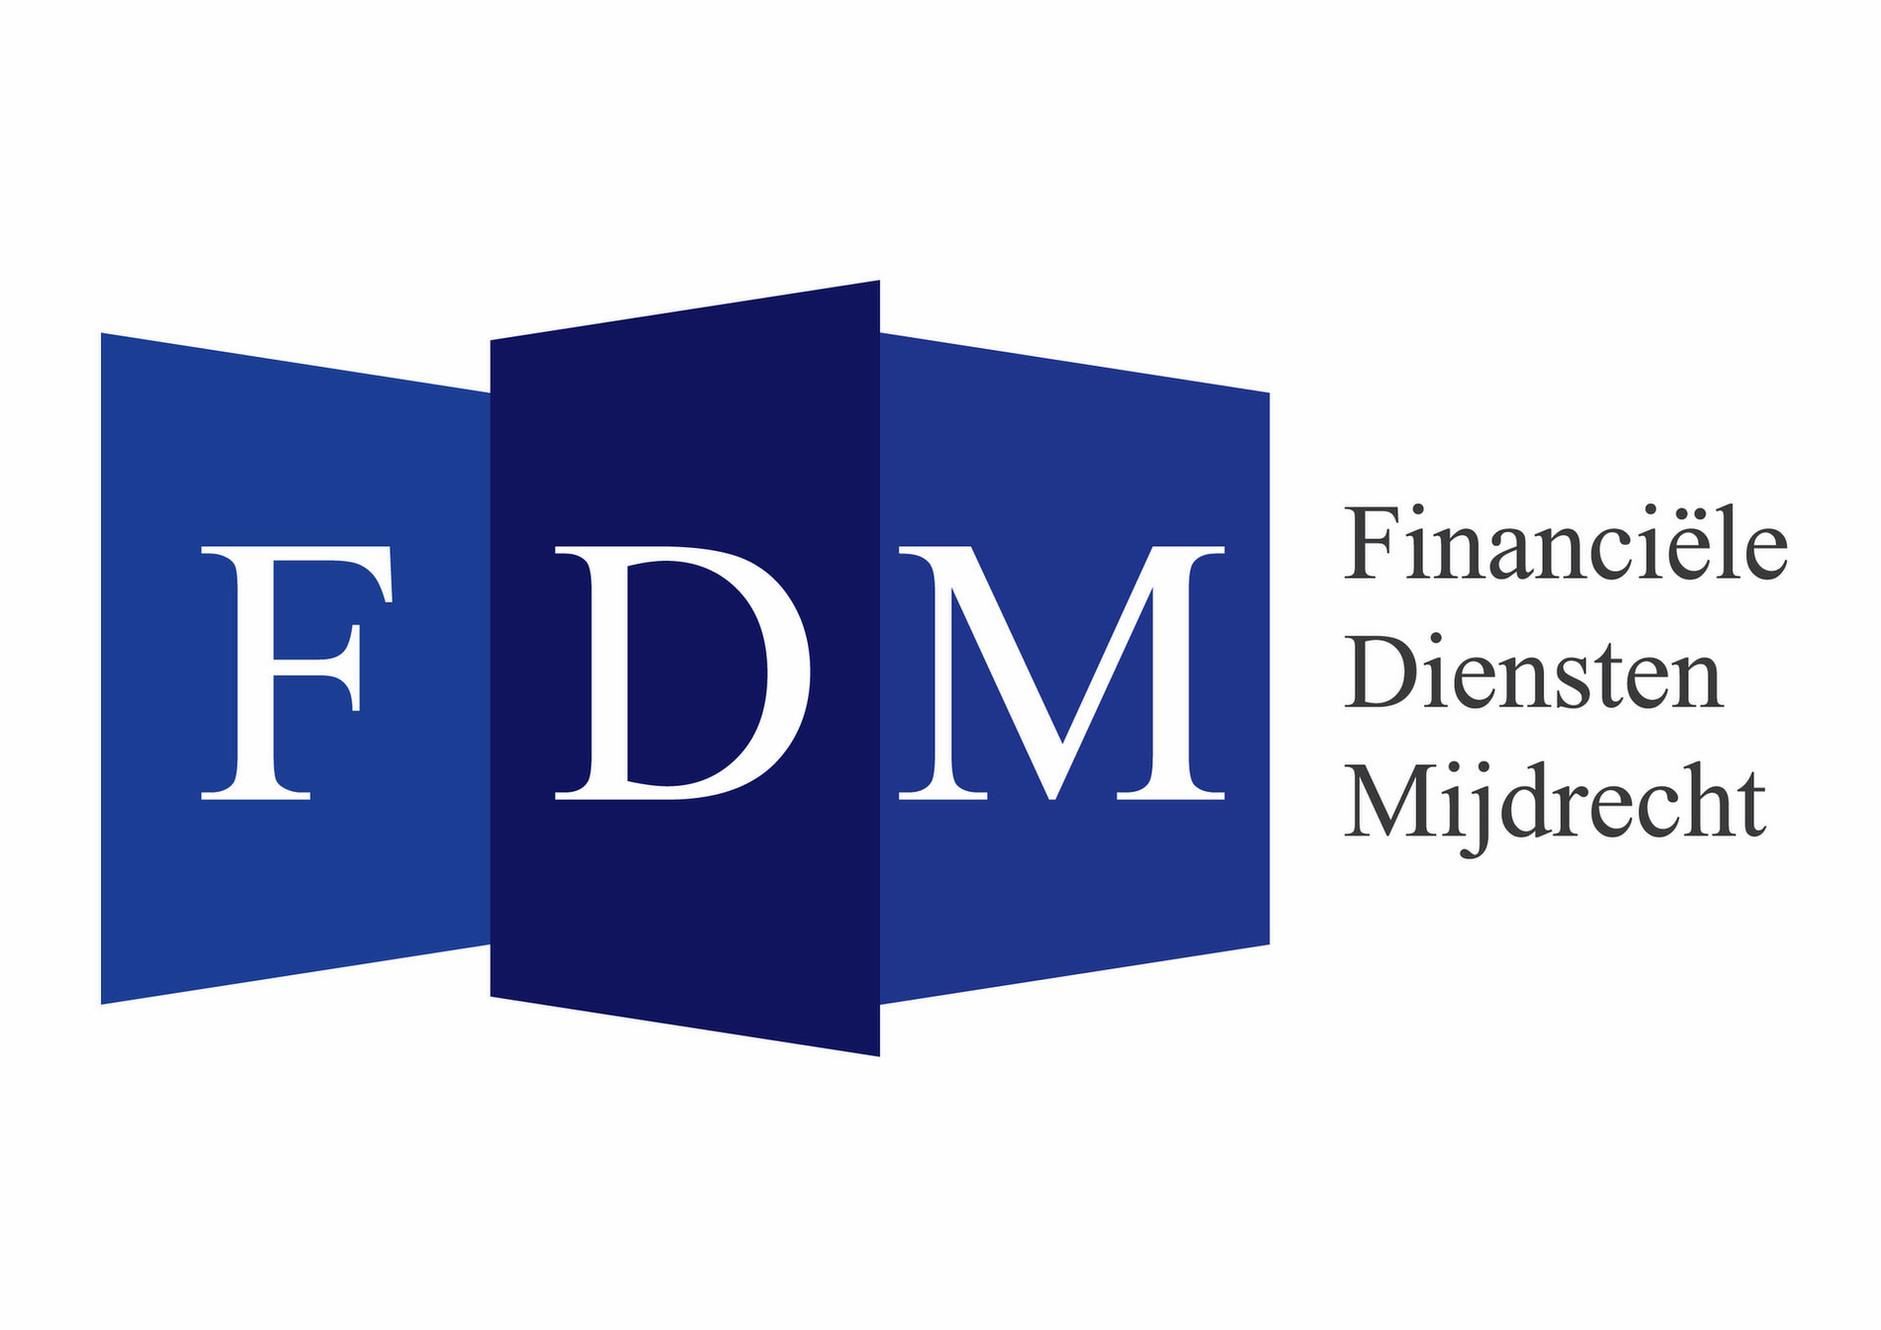 Financiele Diensten Mijdrecht logo